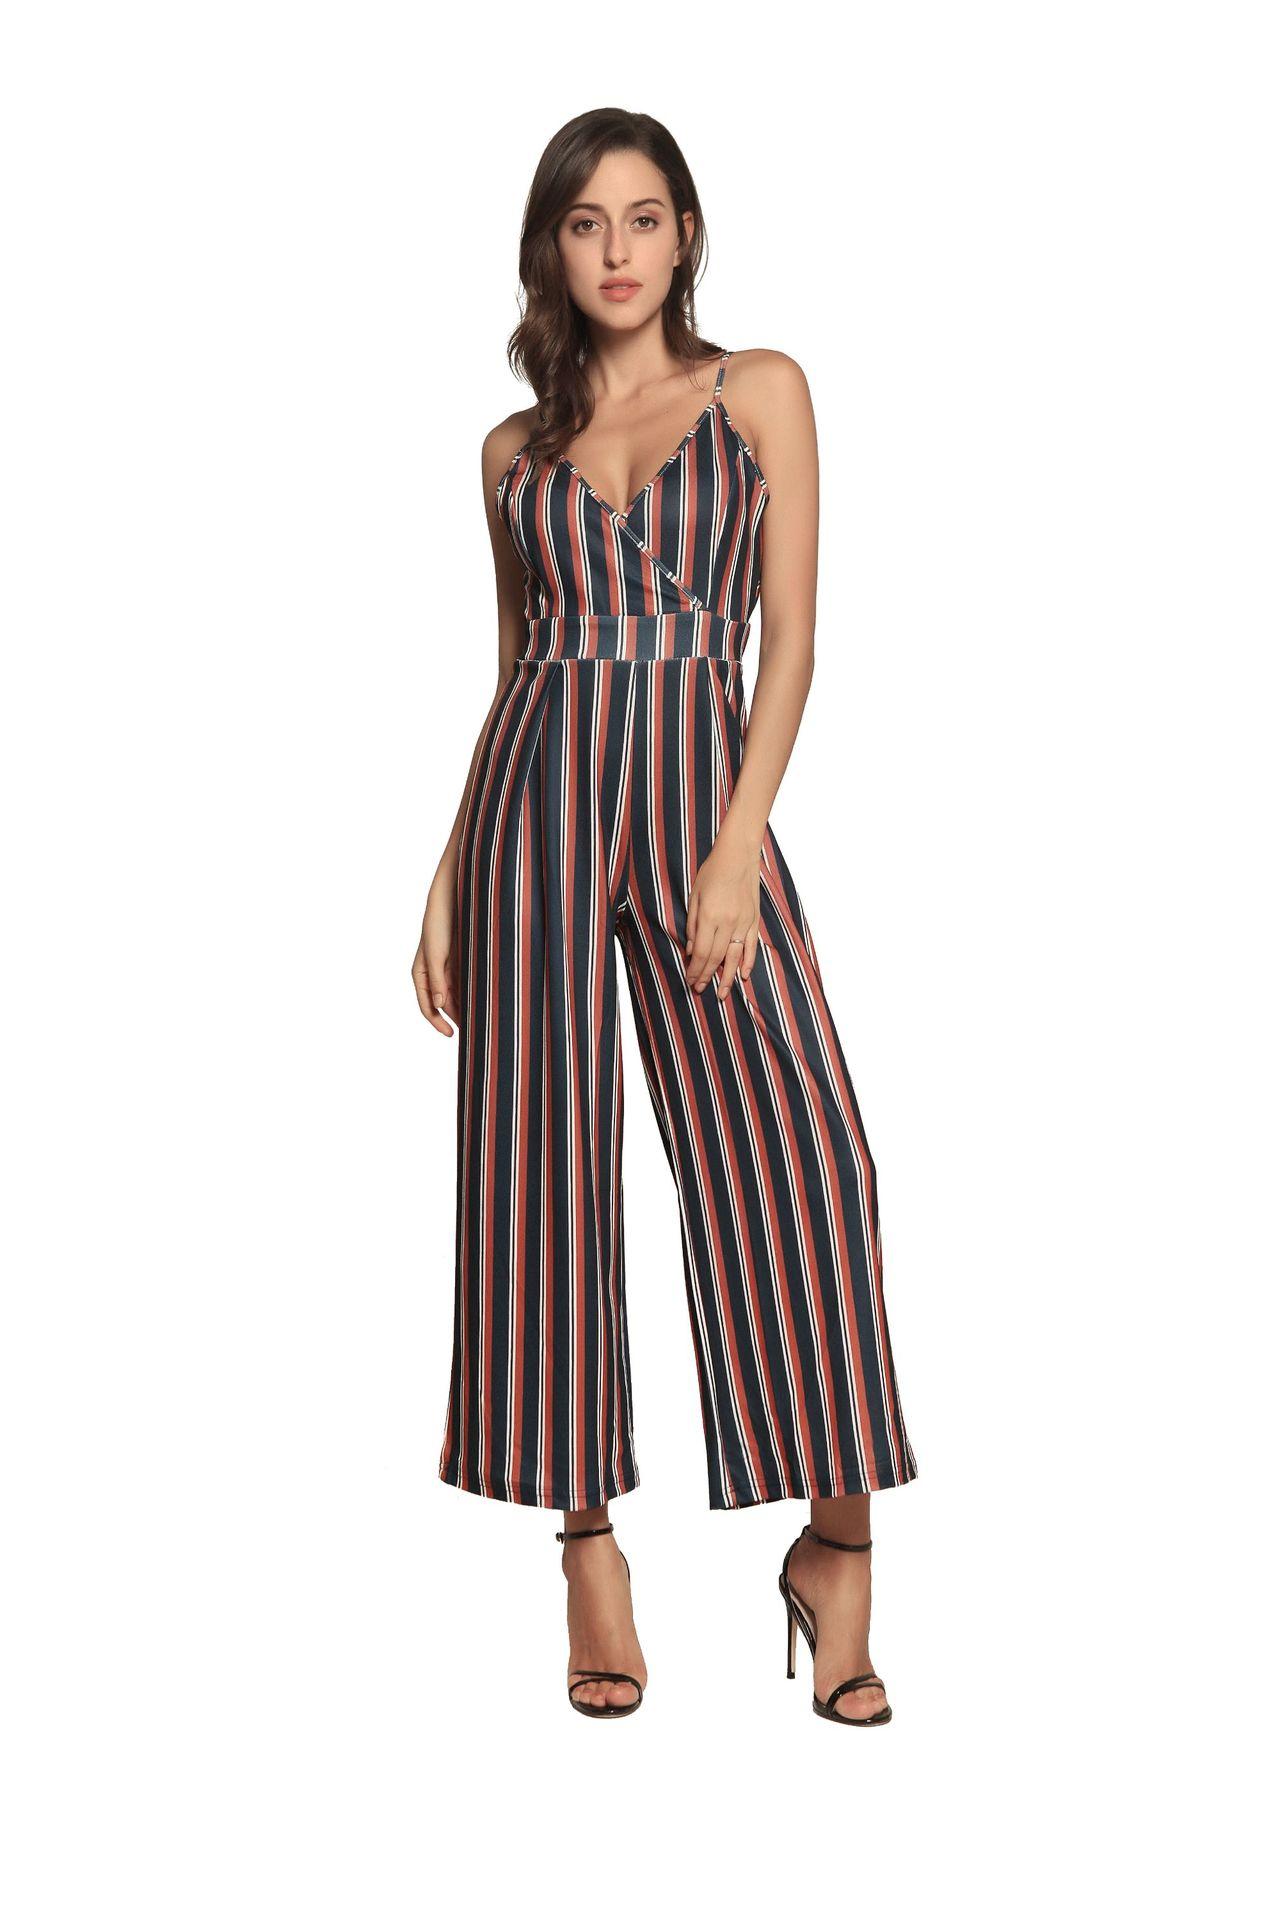 b12beb5227a 2019 Black White Striped Triangulo Jumpsuit Women Plus Size ...